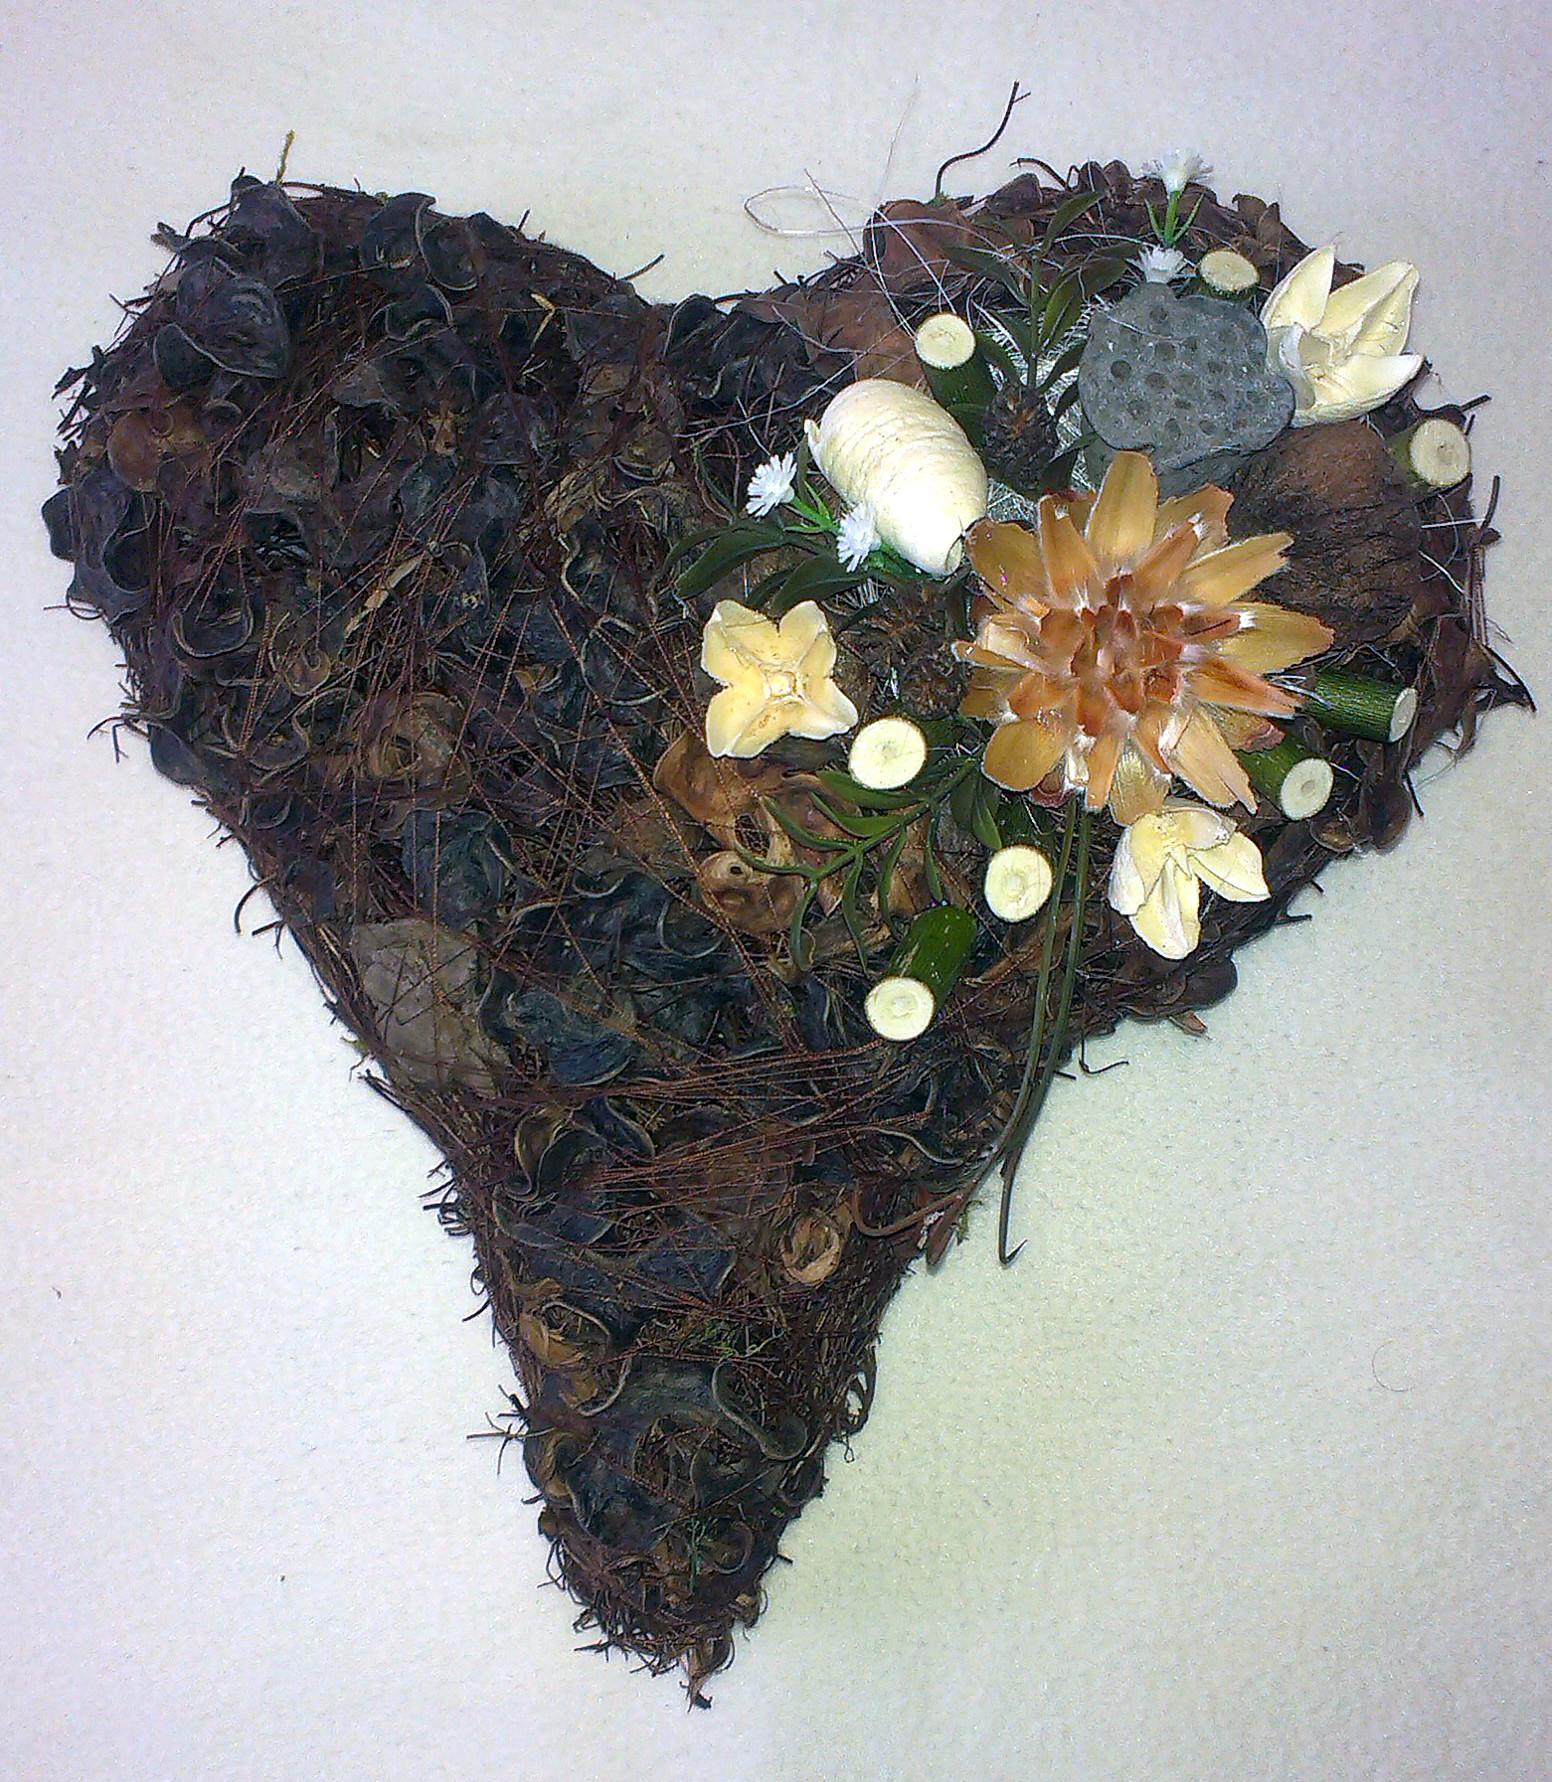 Hnedobiele srdce